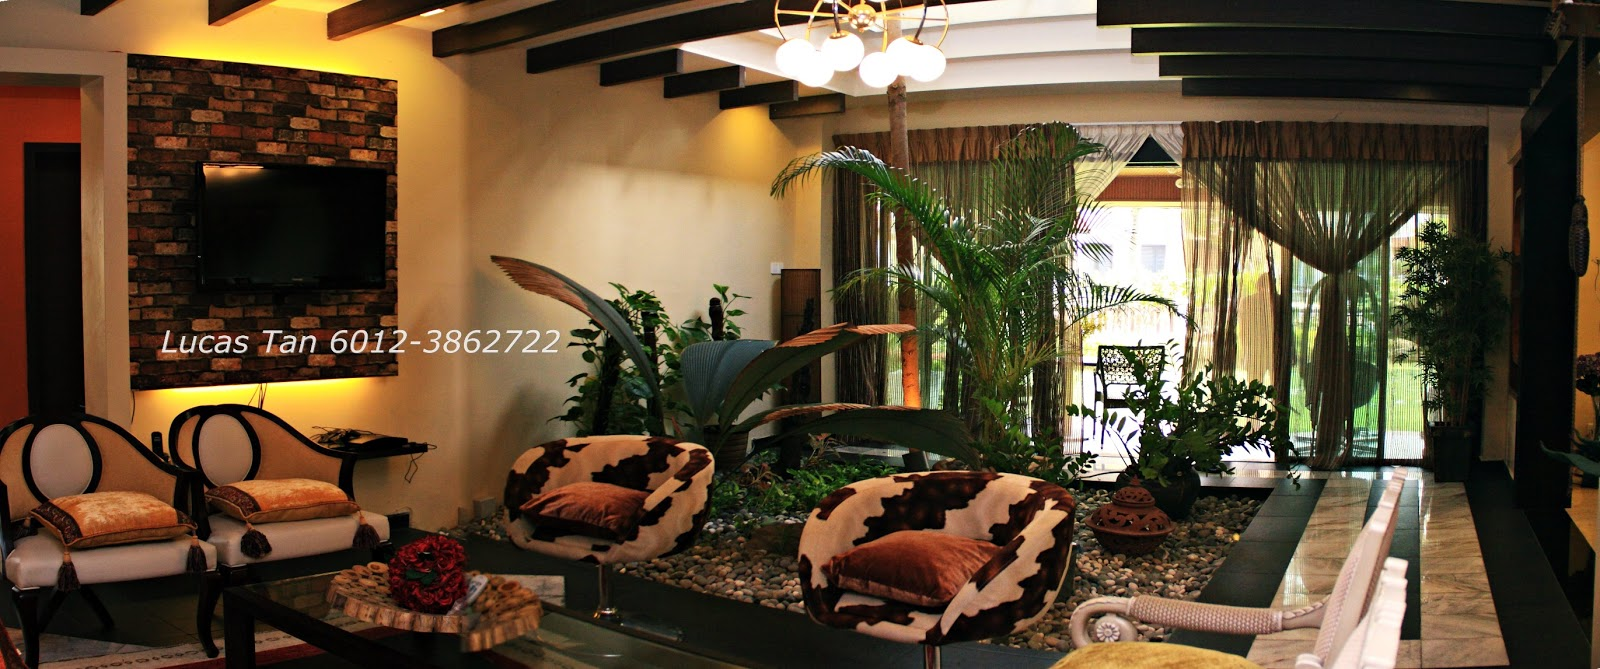 Malaysia property review & real estate agent, LucasPropertySale ... - Indoor Garden Living Room